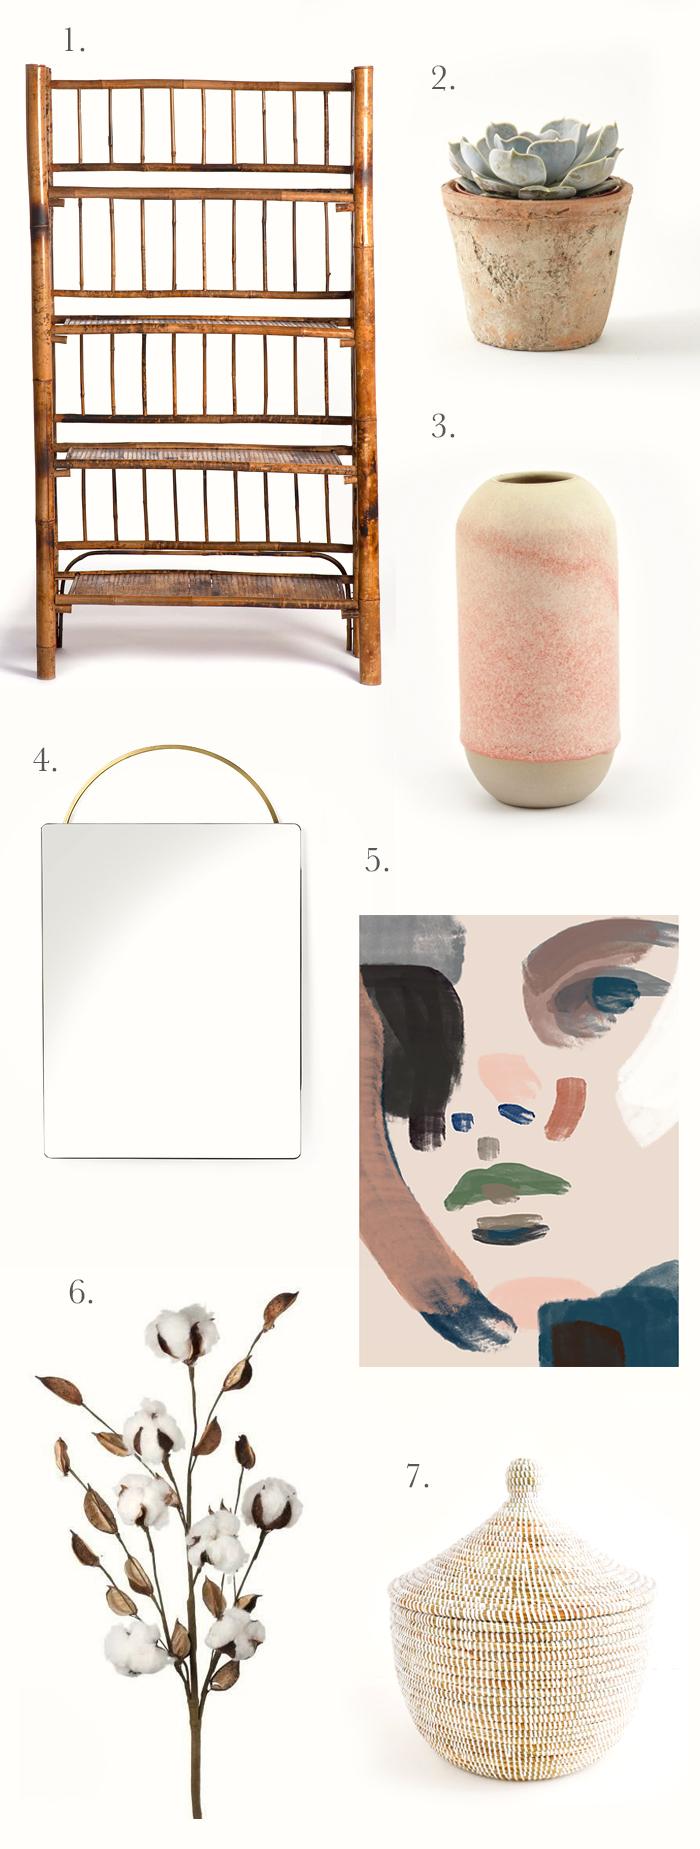 spring-styling-elements-decor-items-interior-nancy-straughan.jpg